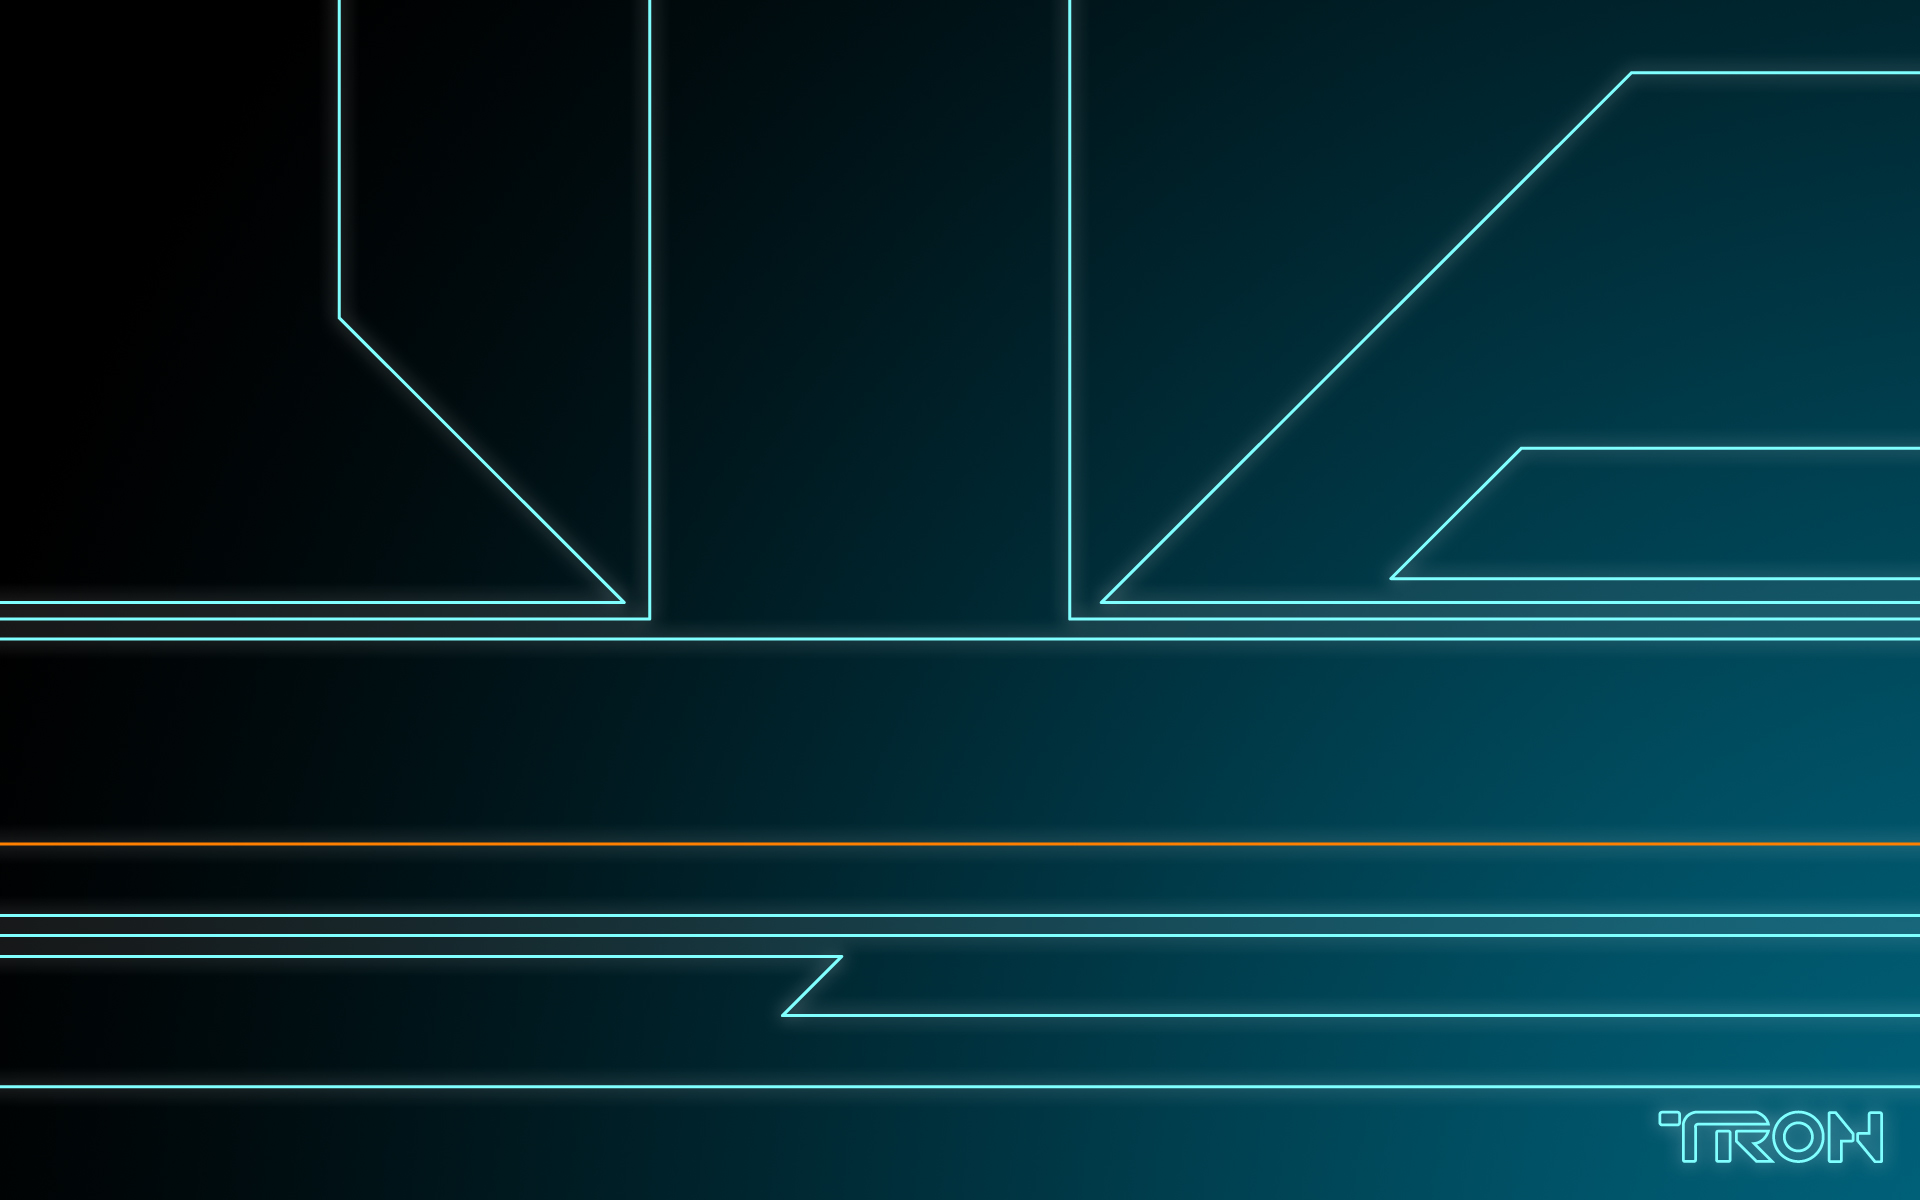 tron legacy grid wallpaper 23630 | movieweb